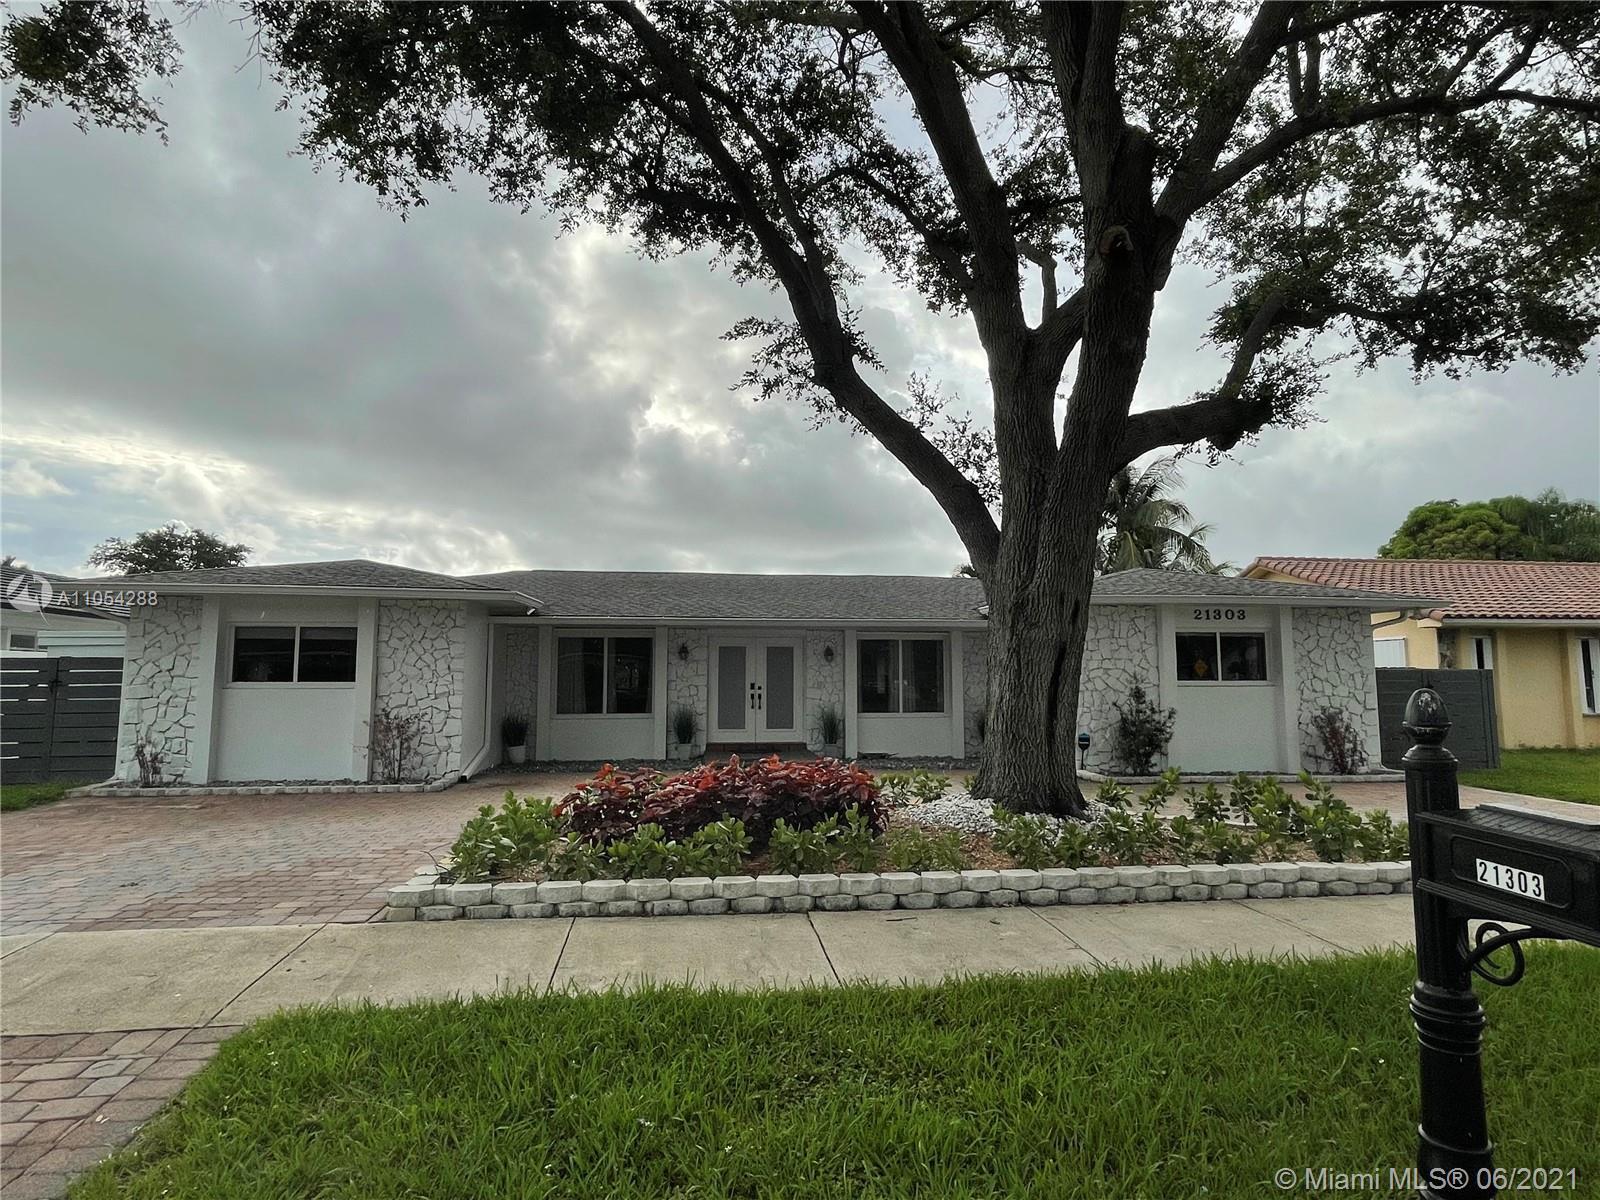 Highland Lakes - 21303 NE 18th Pl, Miami, FL 33179